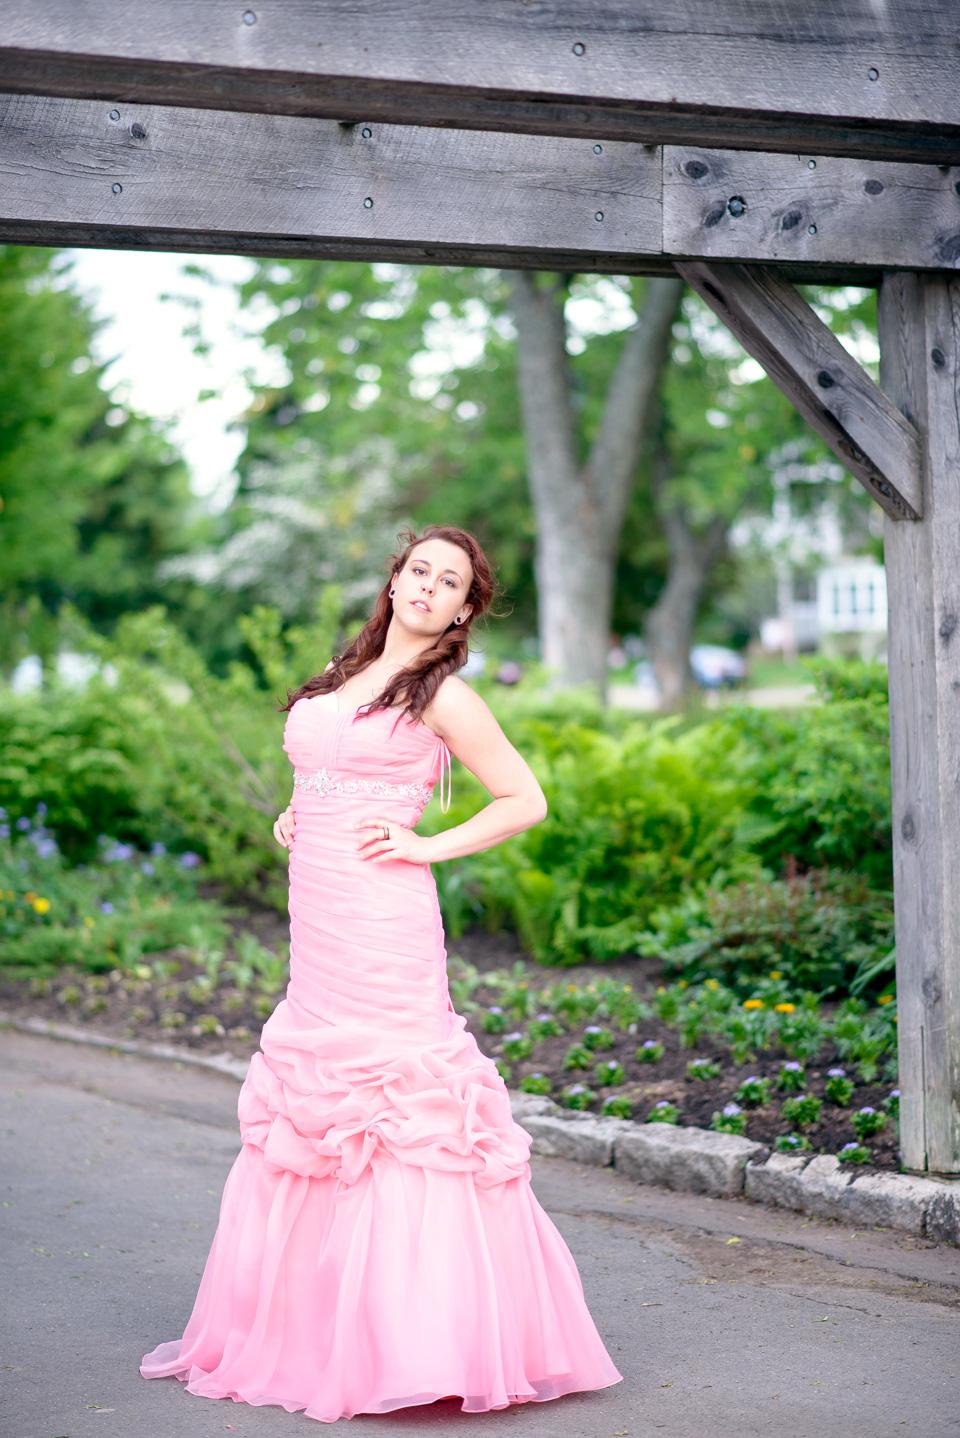 NIgel Fearon Photography | Erica C-17.jpg